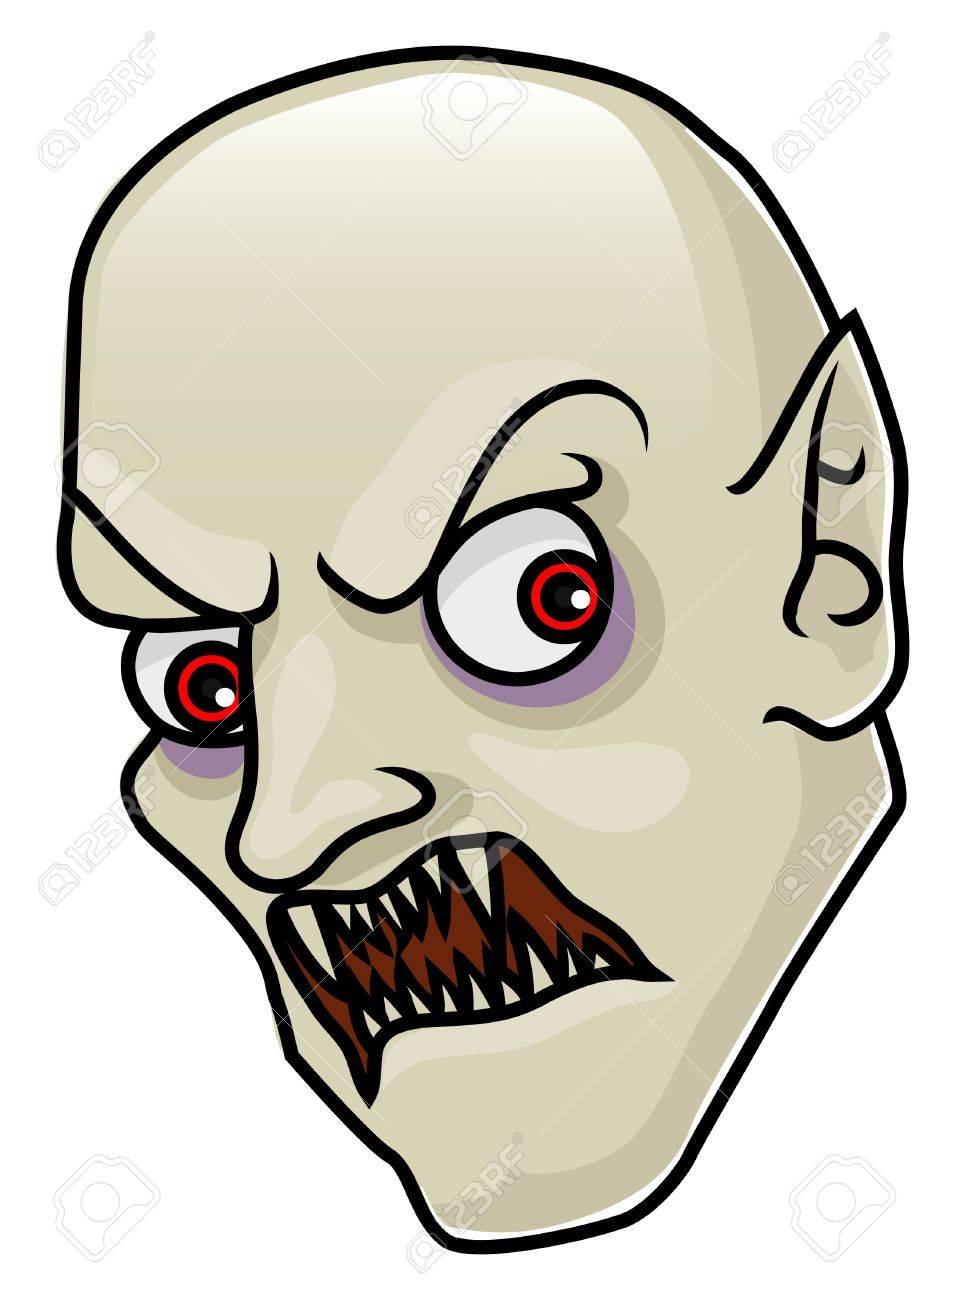 A Cartoon Halloween Vampire Head Or Mask Royalty Free Cliparts ...